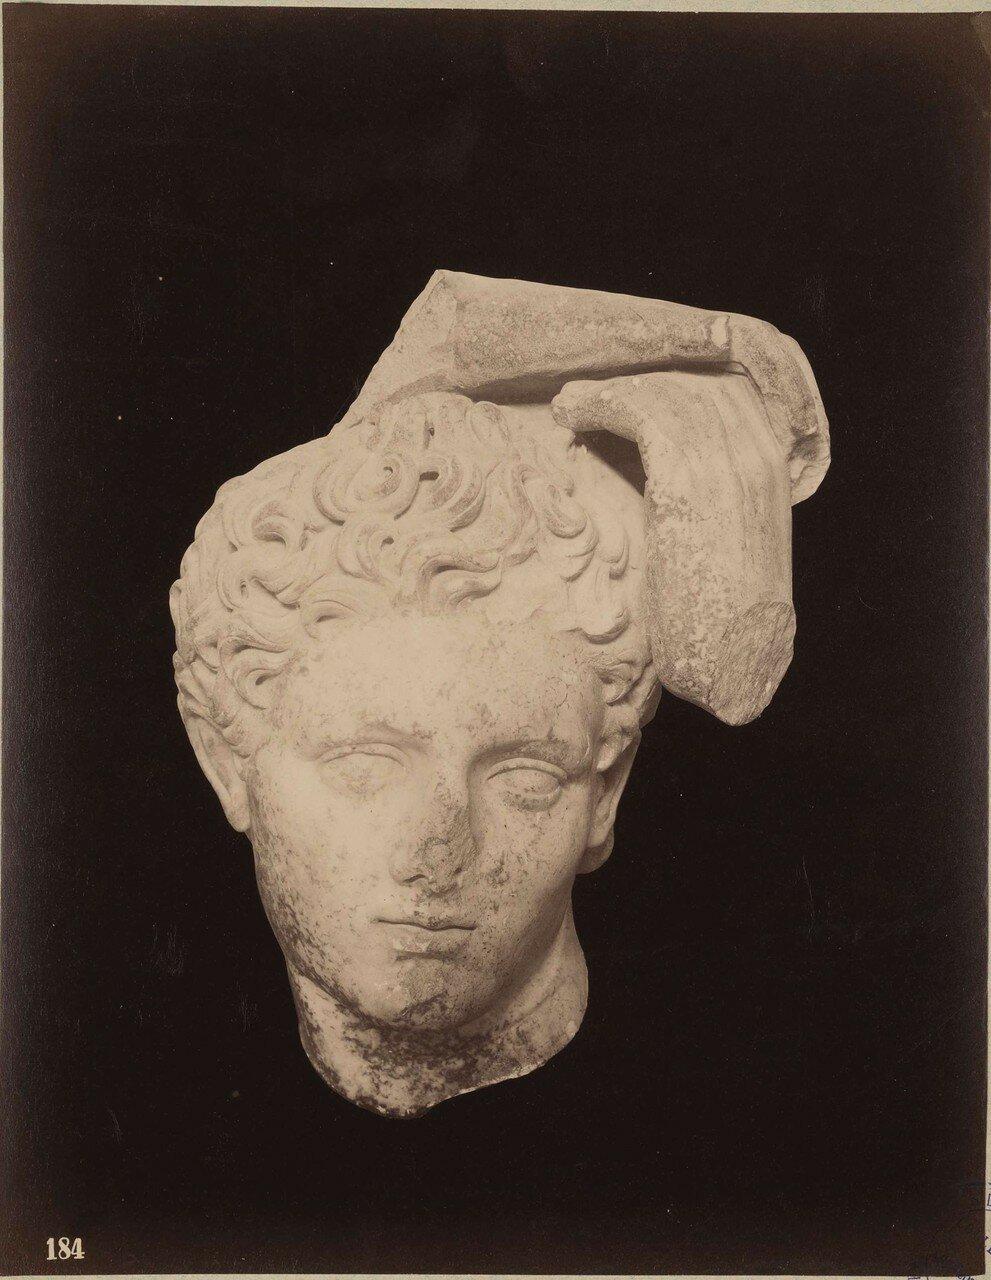 132. Мужская голова (фрагмент)